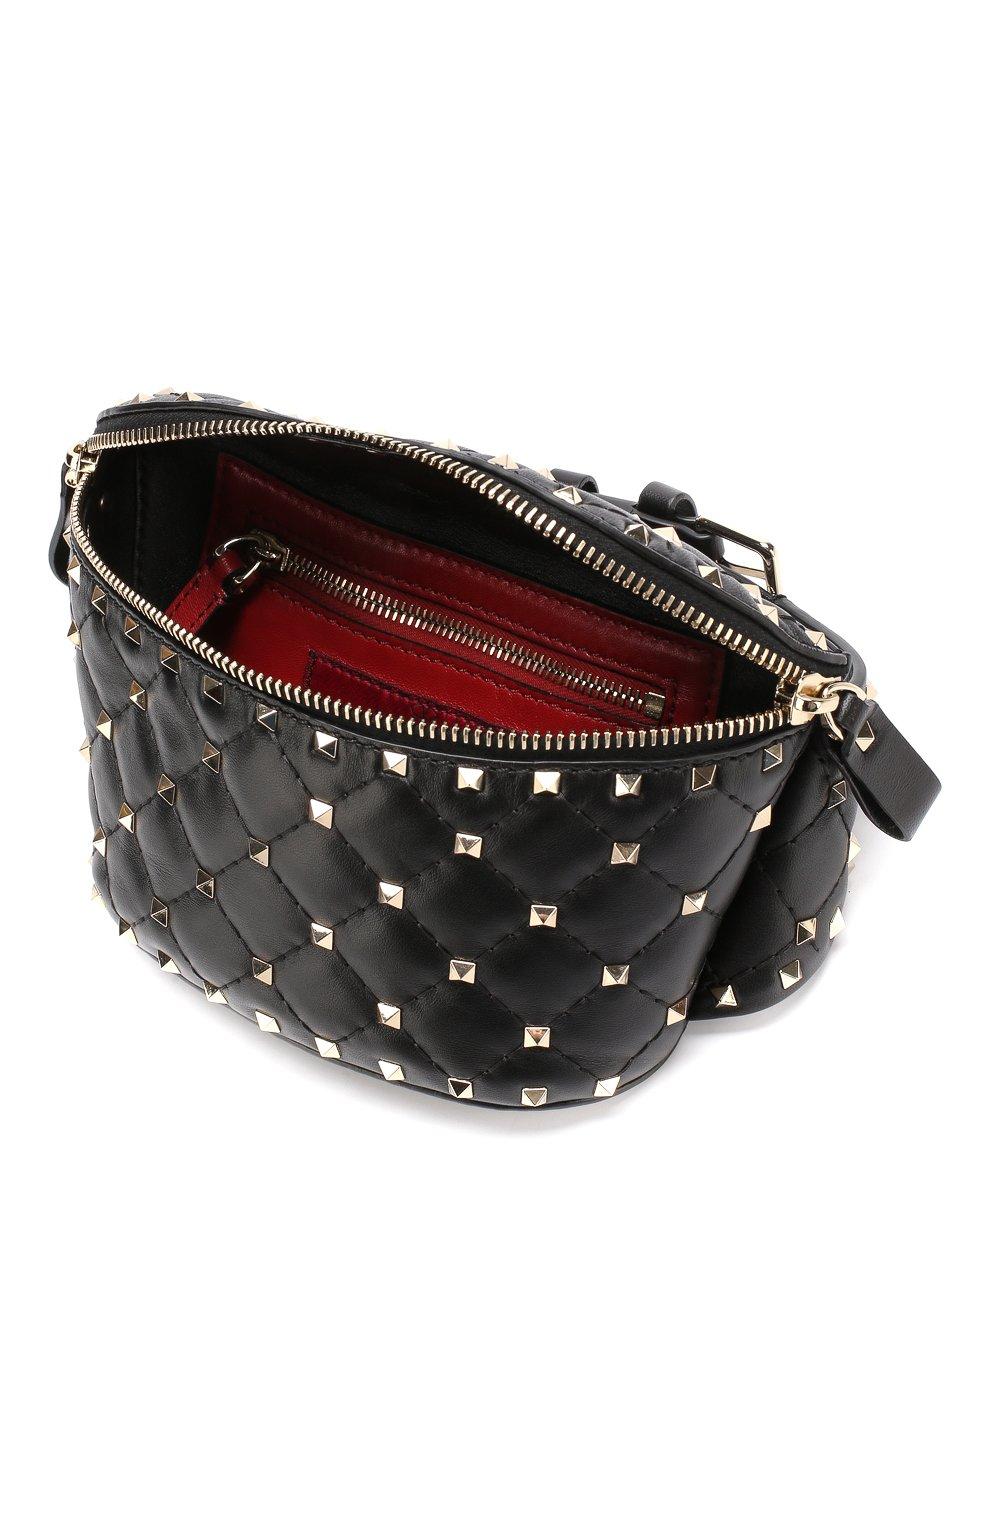 3e180f858474 Поясная сумка Valentino Garavani Rockstud Spike Valentino черная | Фото №4